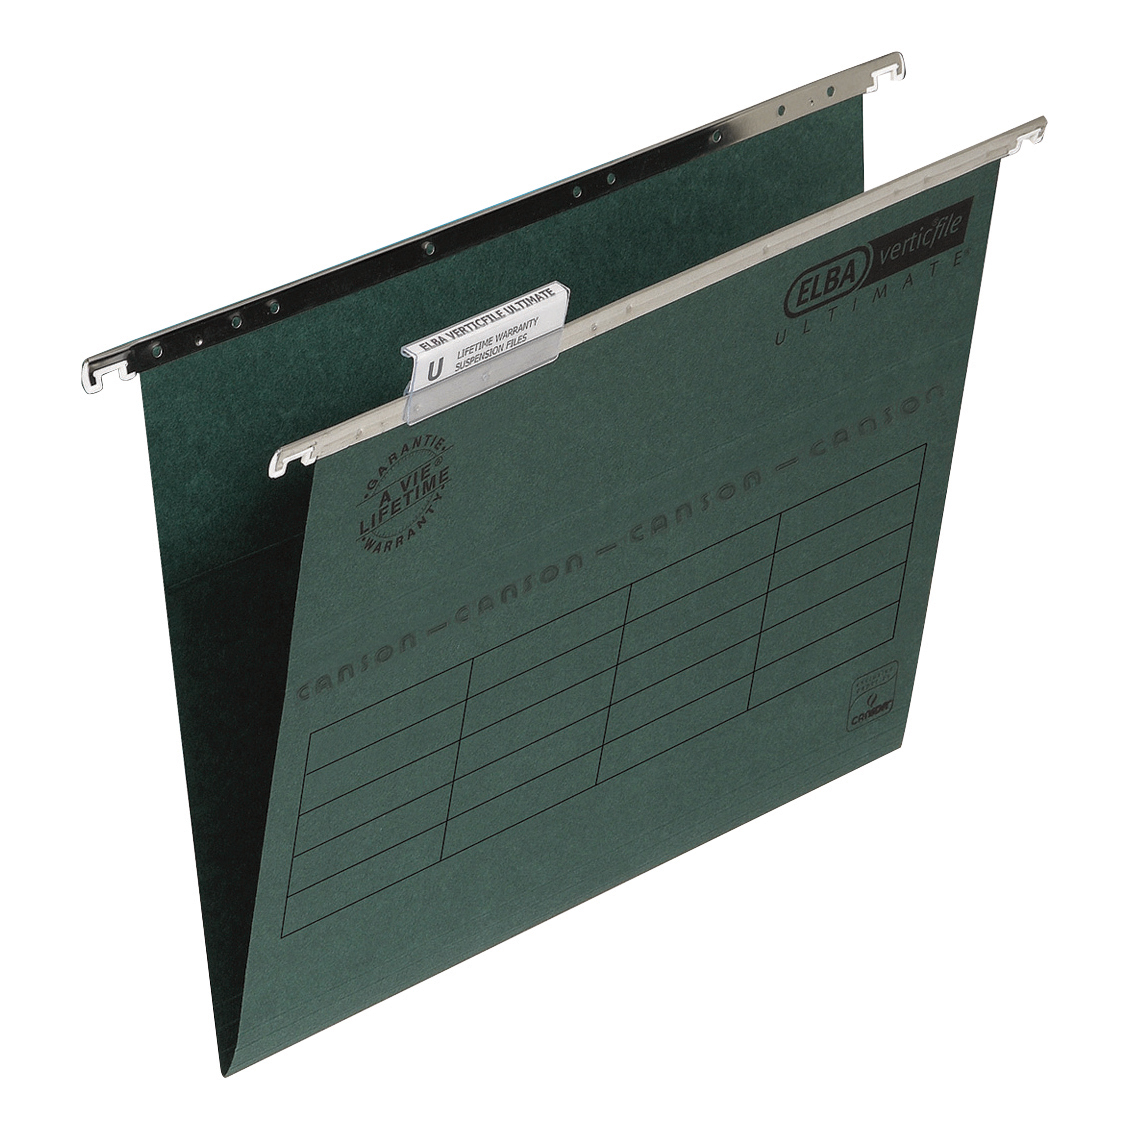 Elba Verticfile Ultimate Suspension File 15mm V-base Manilla 240gsm A4 Green Ref 100331251 [Pack 50]